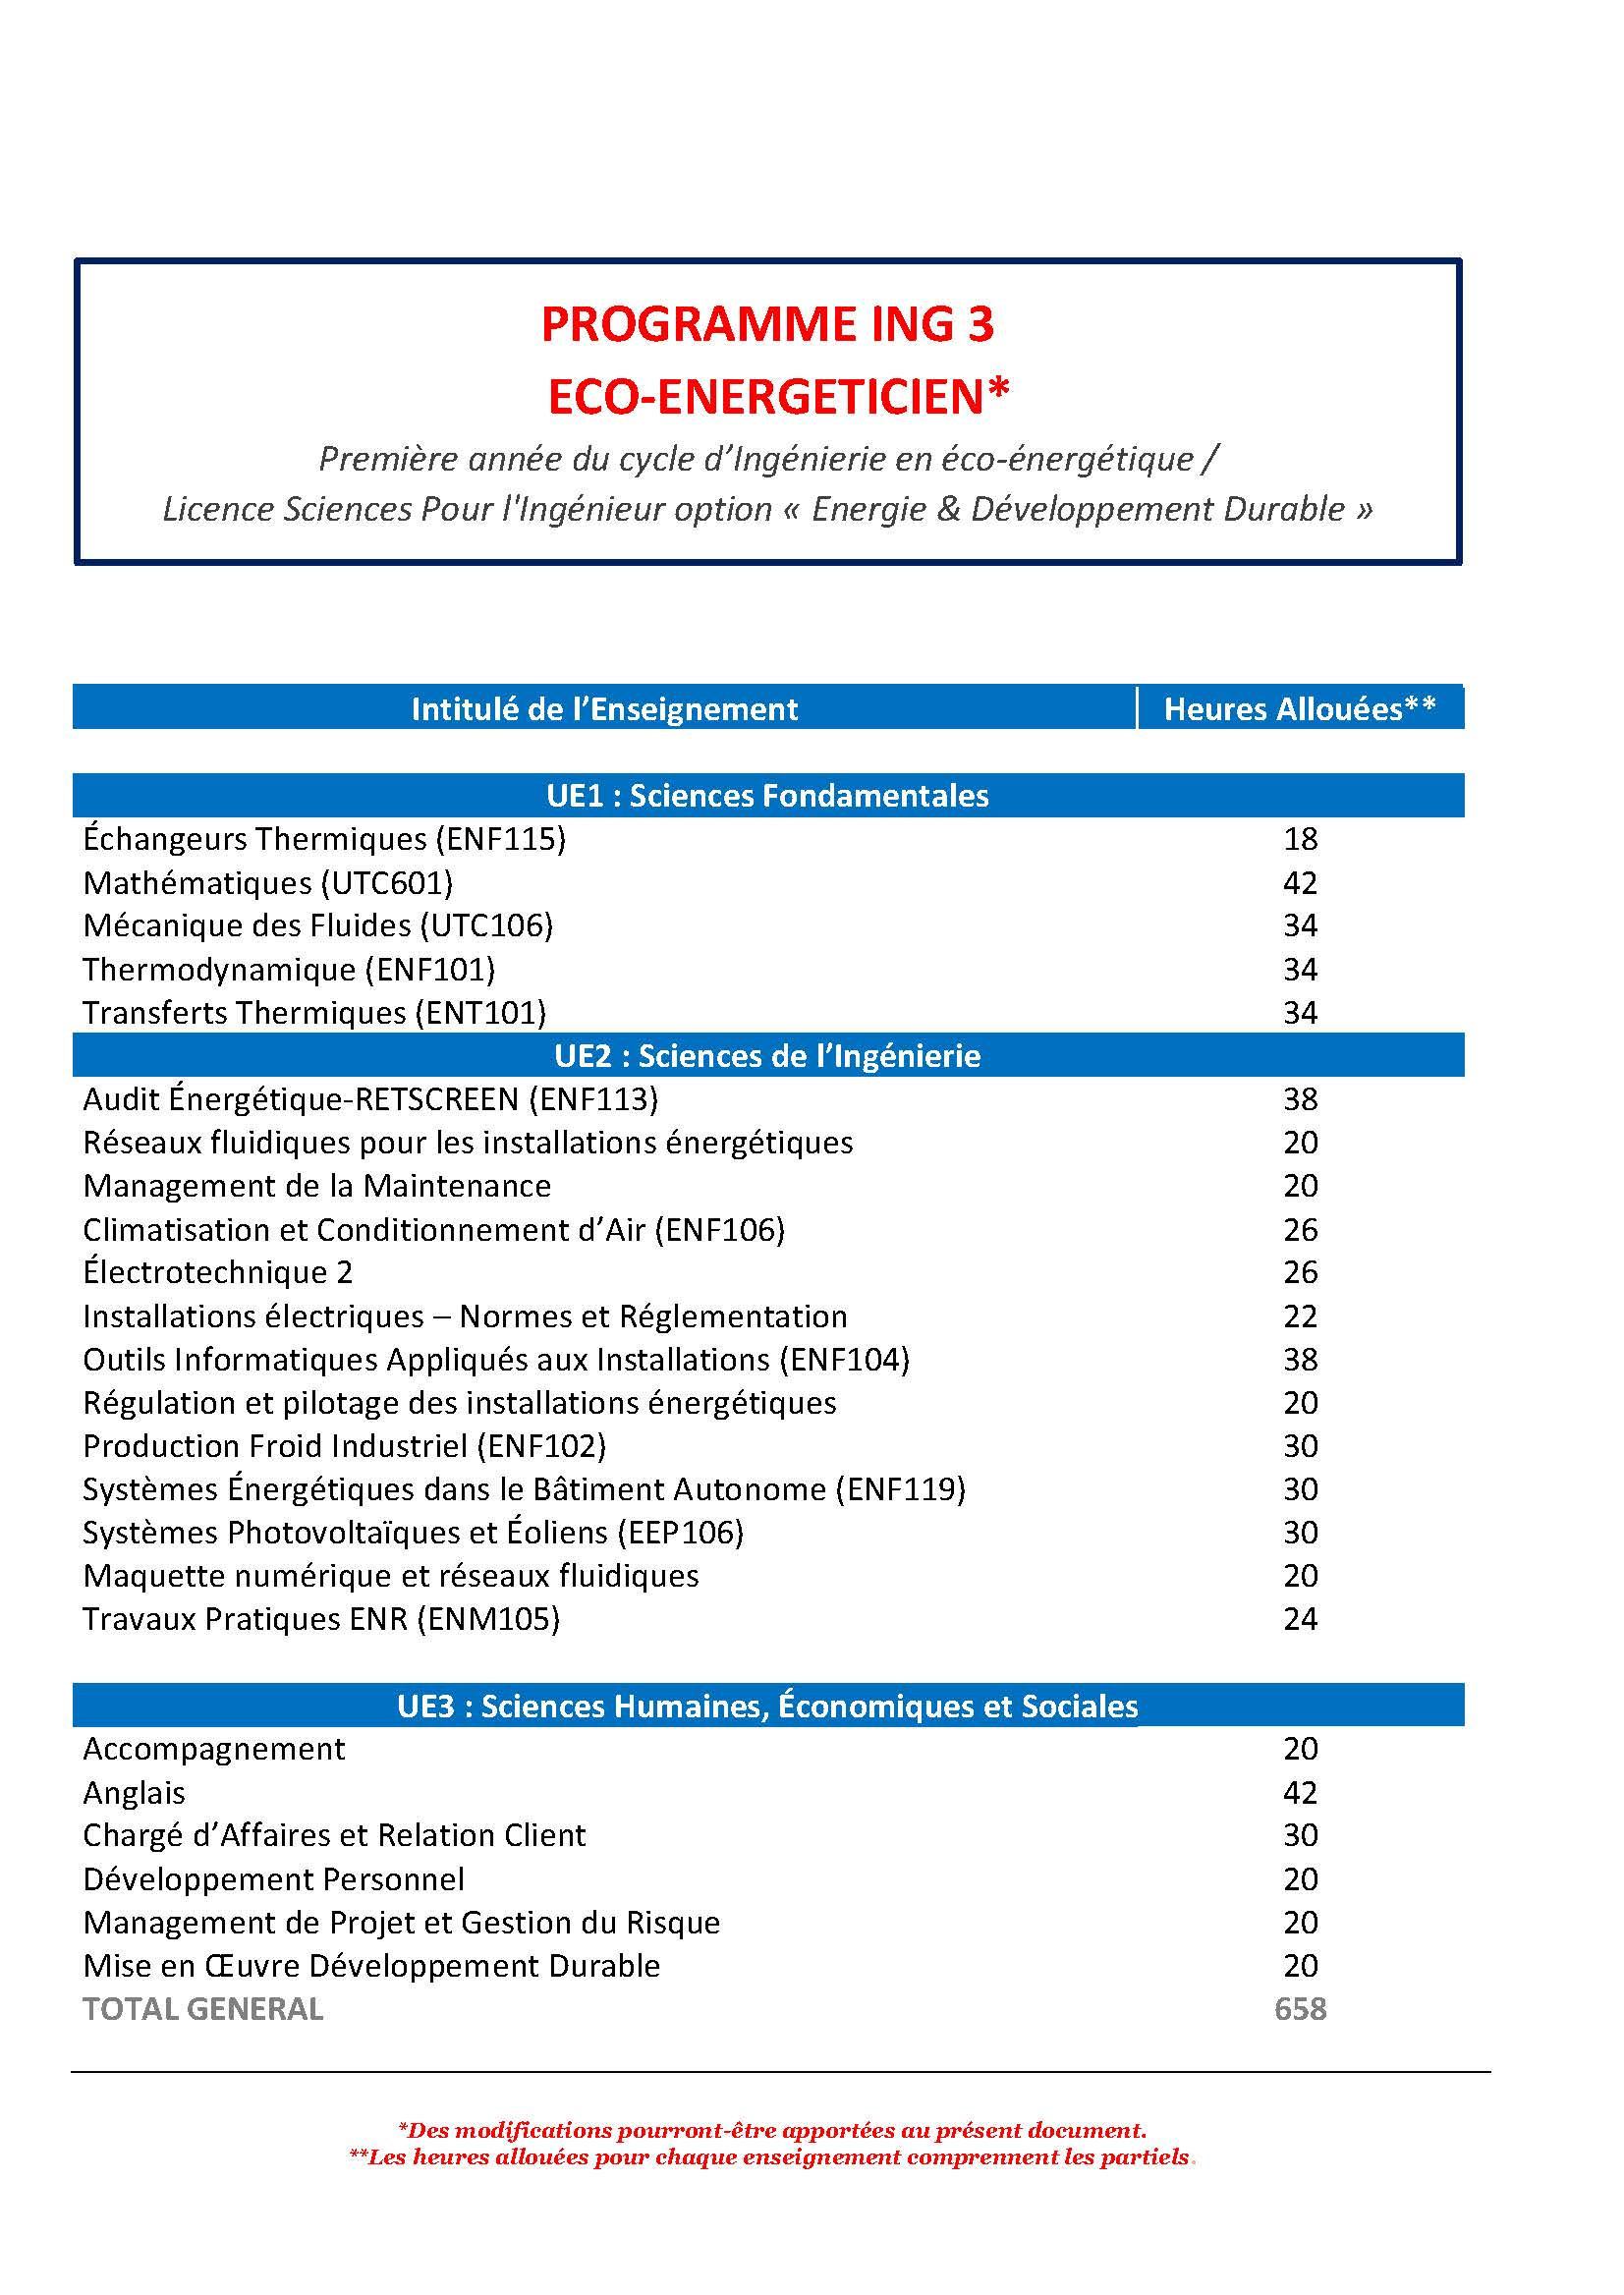 Ensiate - programme ING 3